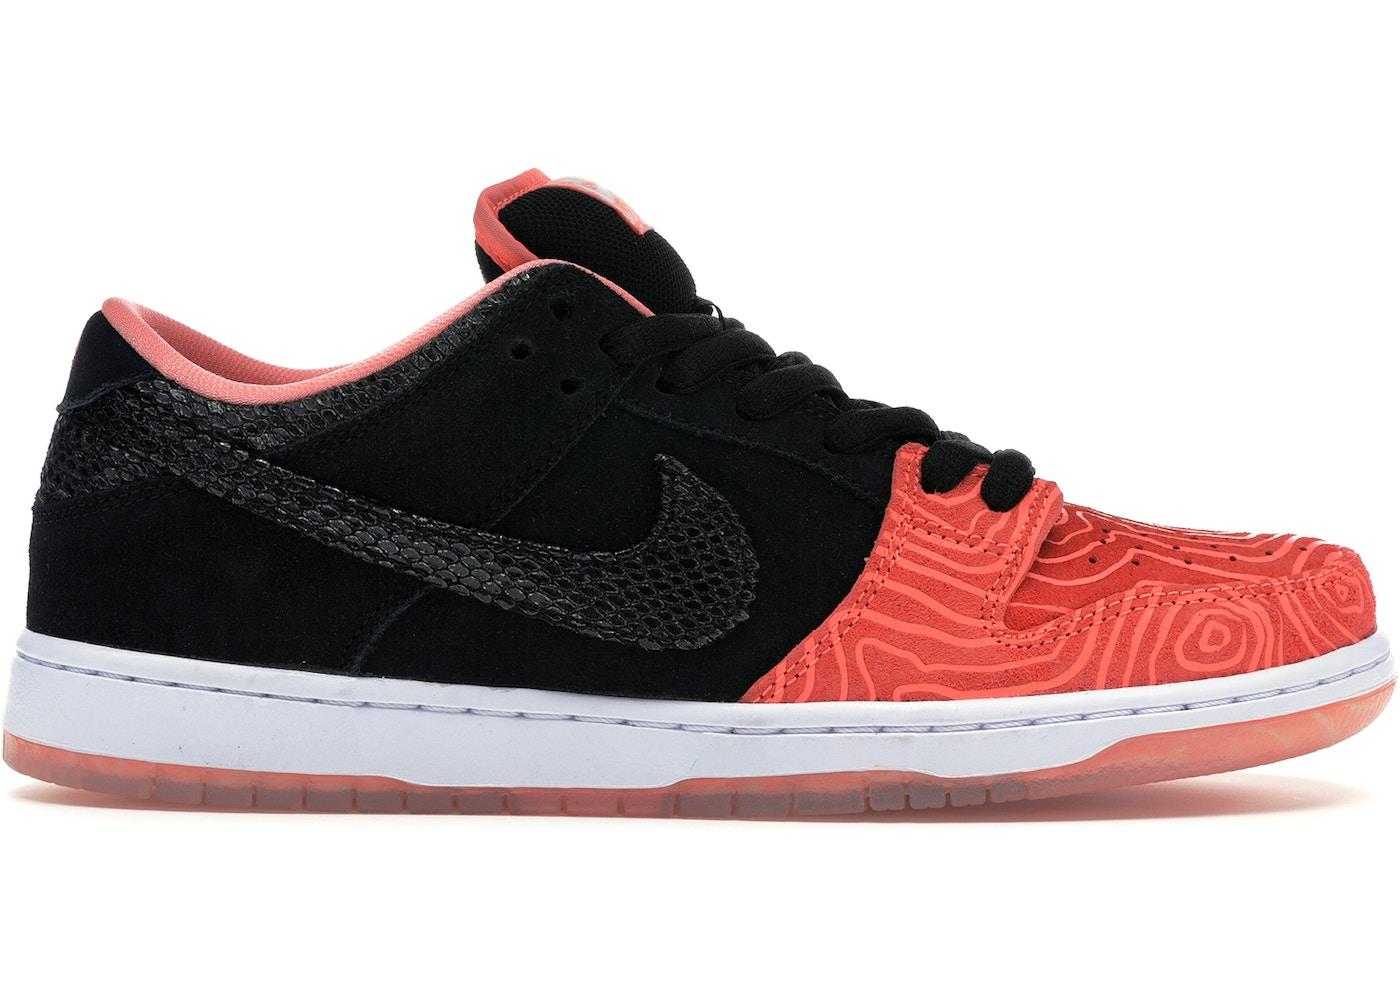 7075a9f1a3be Nike Dunk SB Low Premier Fish Ladder - 313170-603